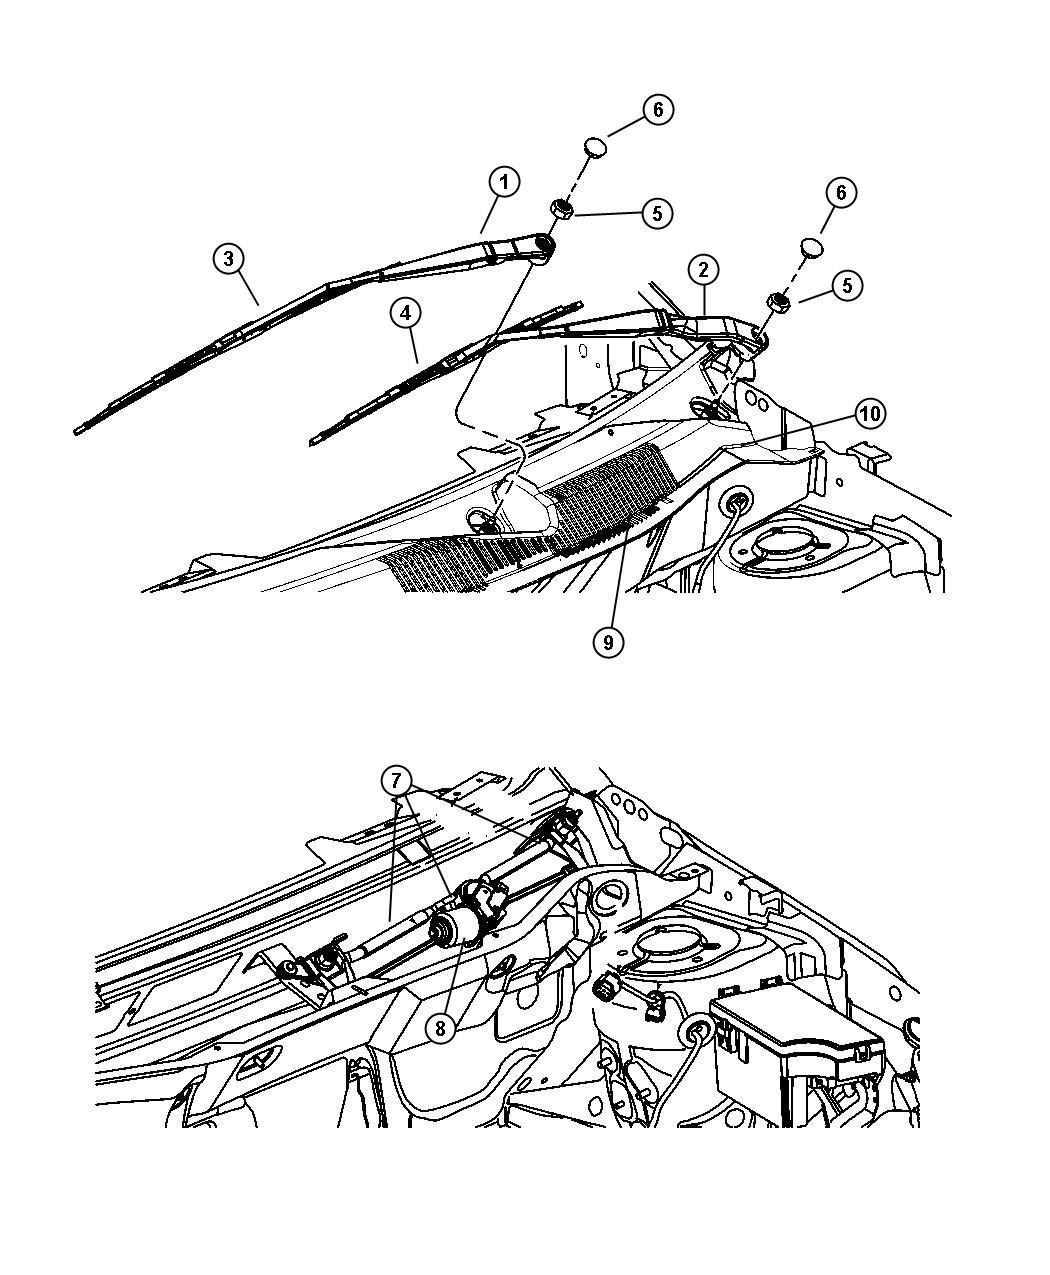 2011 Dodge Caliber Arm. Front wiper, wiper. Left